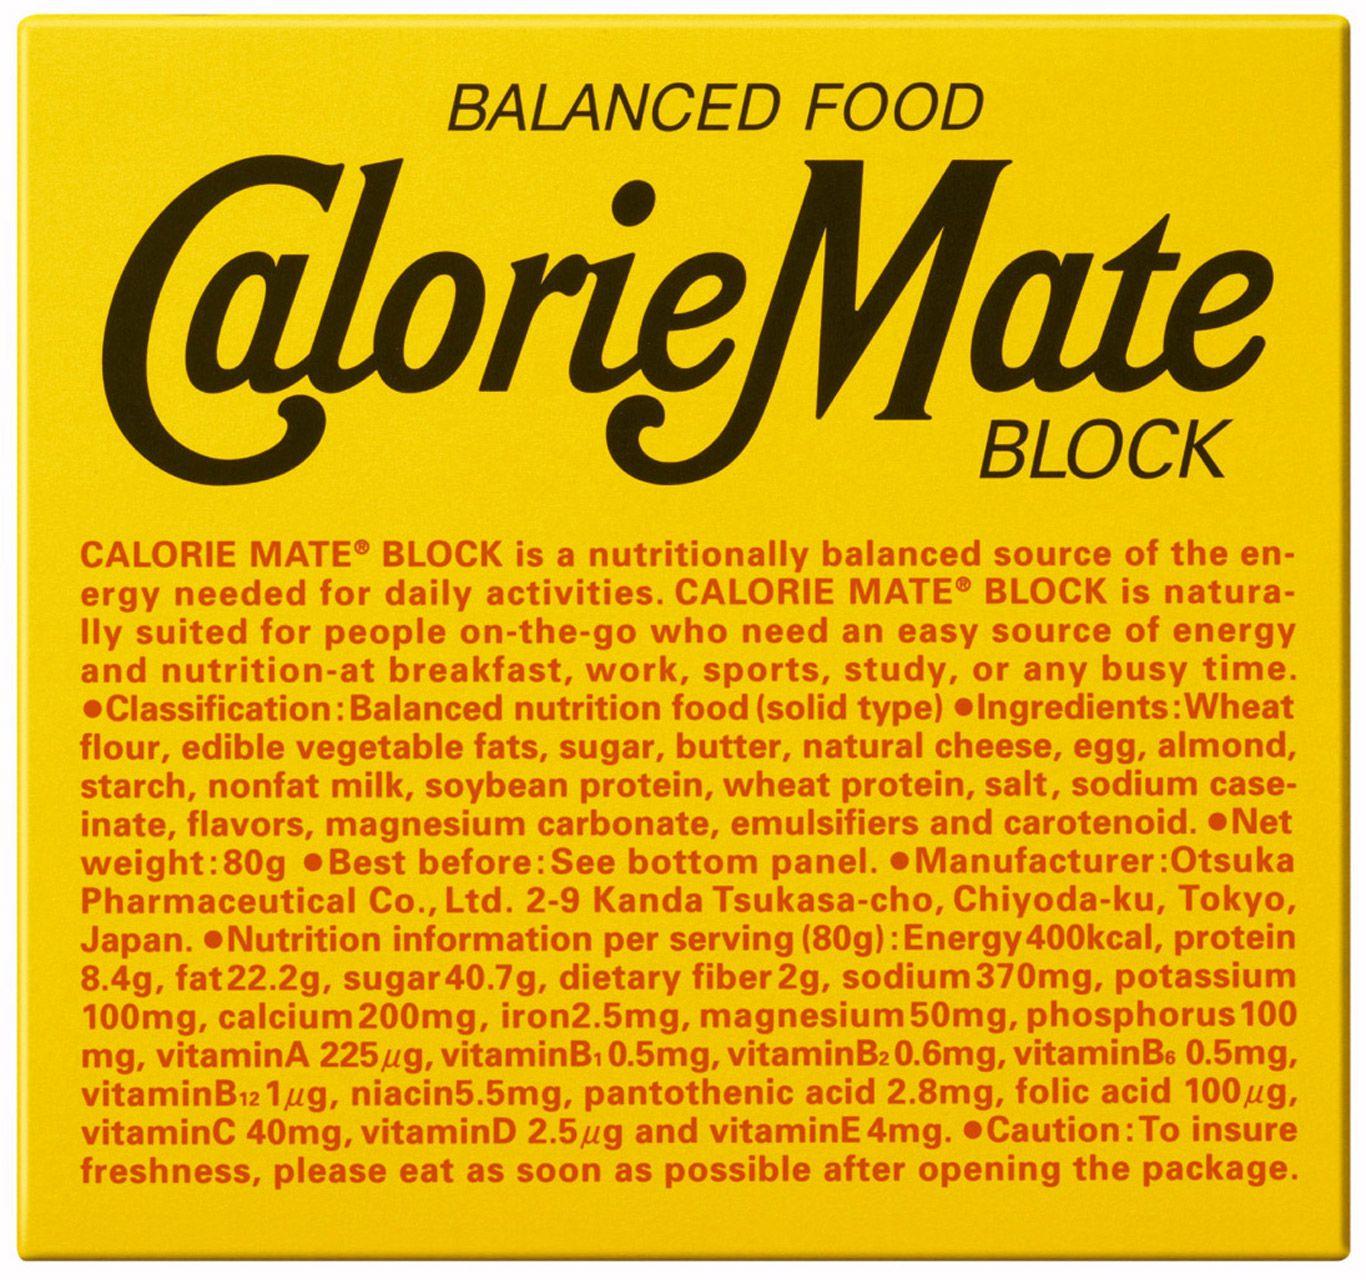 Image Source おしゃれまとめの人気アイデア Pinterest Noriteru Ino 栄養 栄養素 ダイエット